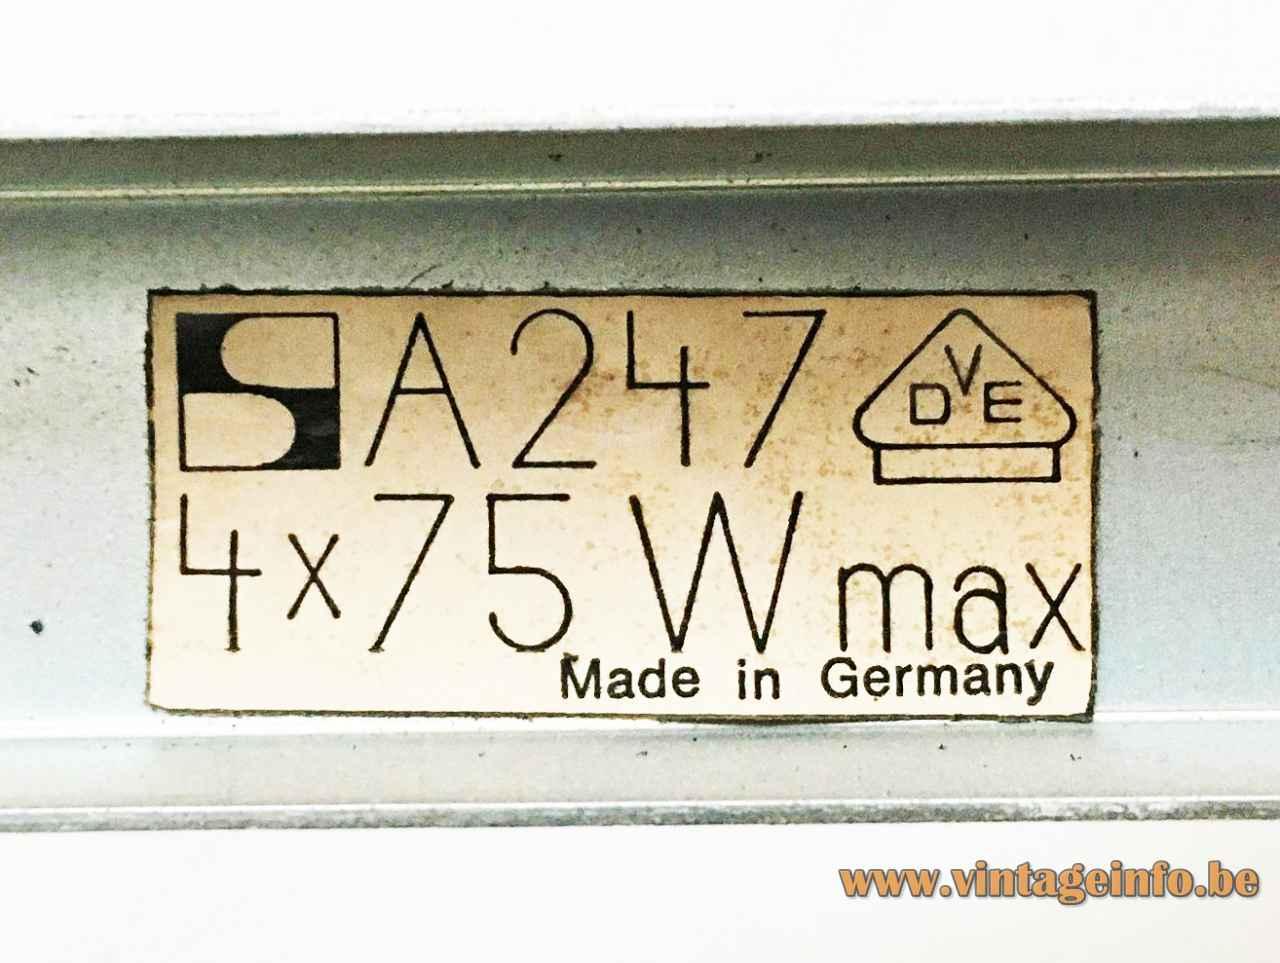 Dieter Witte Oyster wall lamp model A247 Staff label 4 x 75 Watt 1960s Germany 1963 design